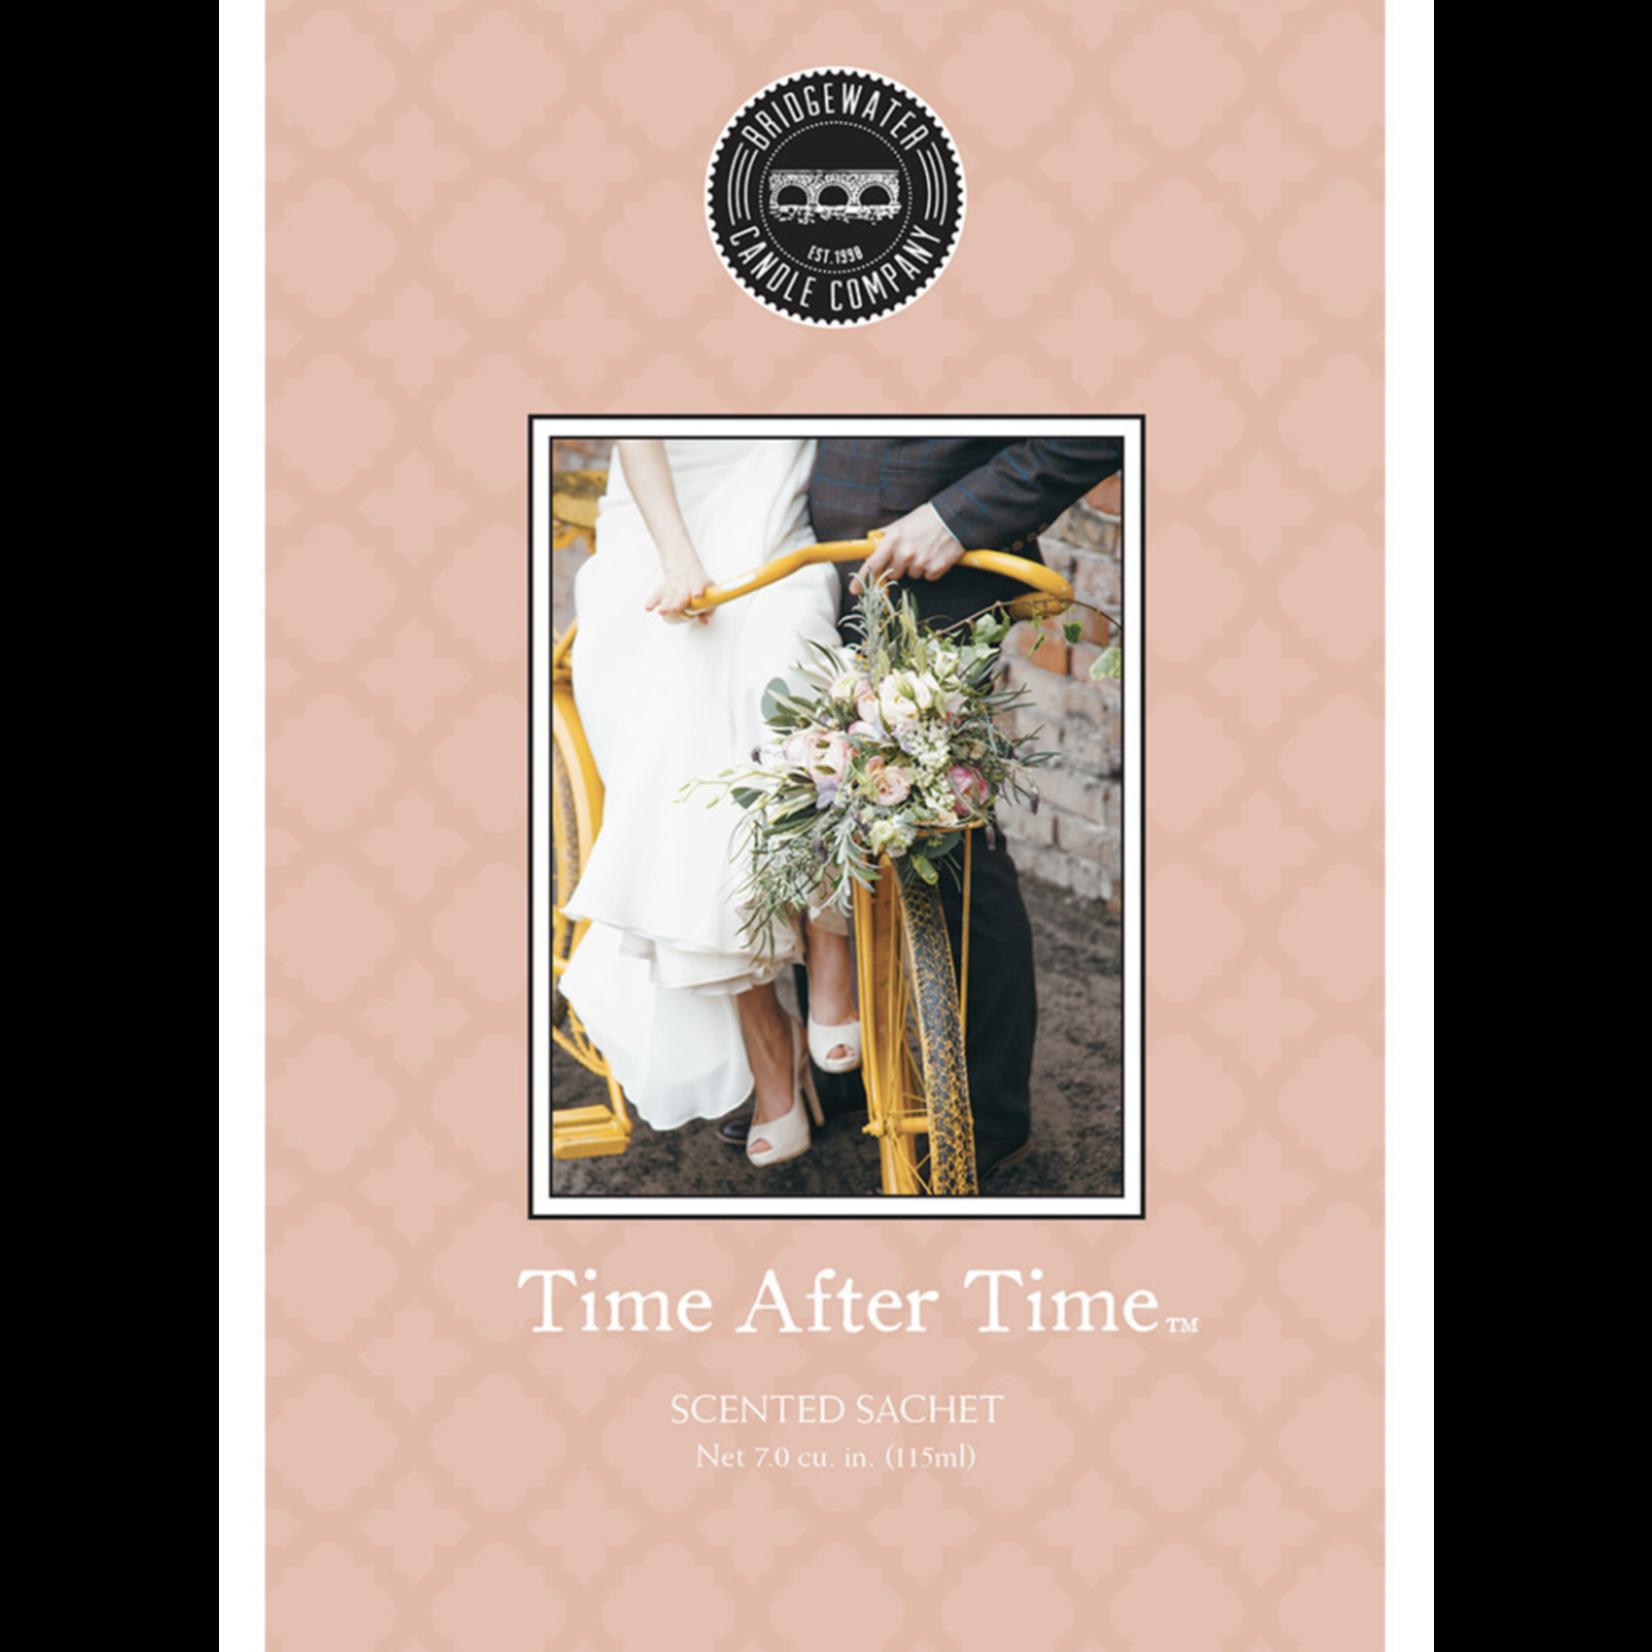 Bridgewater Scented Sachet / Geurzakje Time After Time